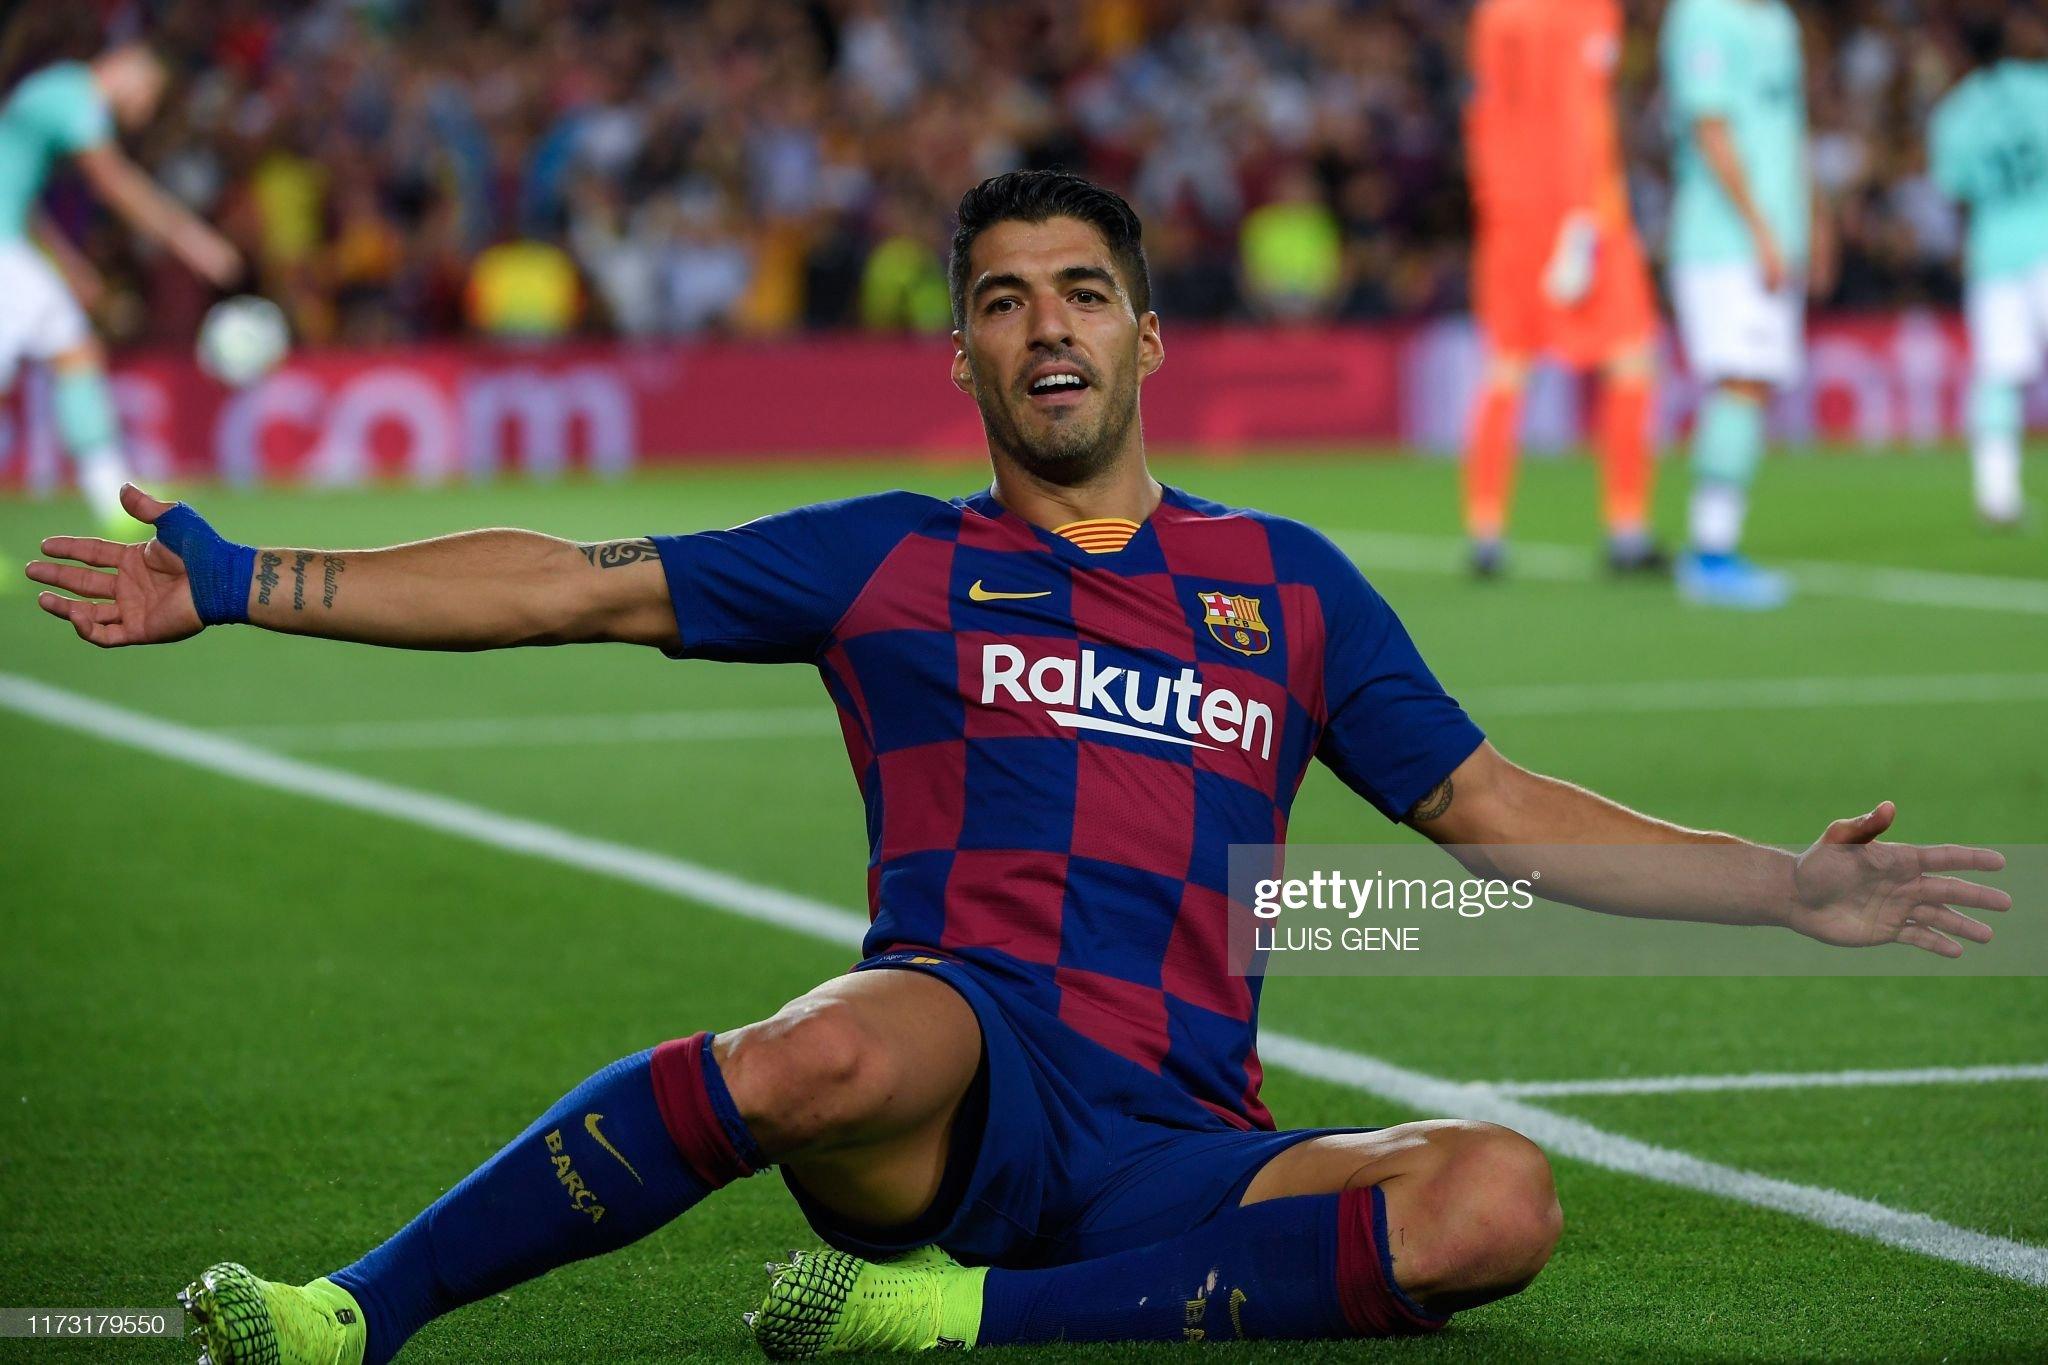 صور مباراة : برشلونة - إنتر 2-1 ( 02-10-2019 )  Barcelonas-uruguayan-forward-luis-suarez-celebrates-after-scoring-a-picture-id1173179550?s=2048x2048